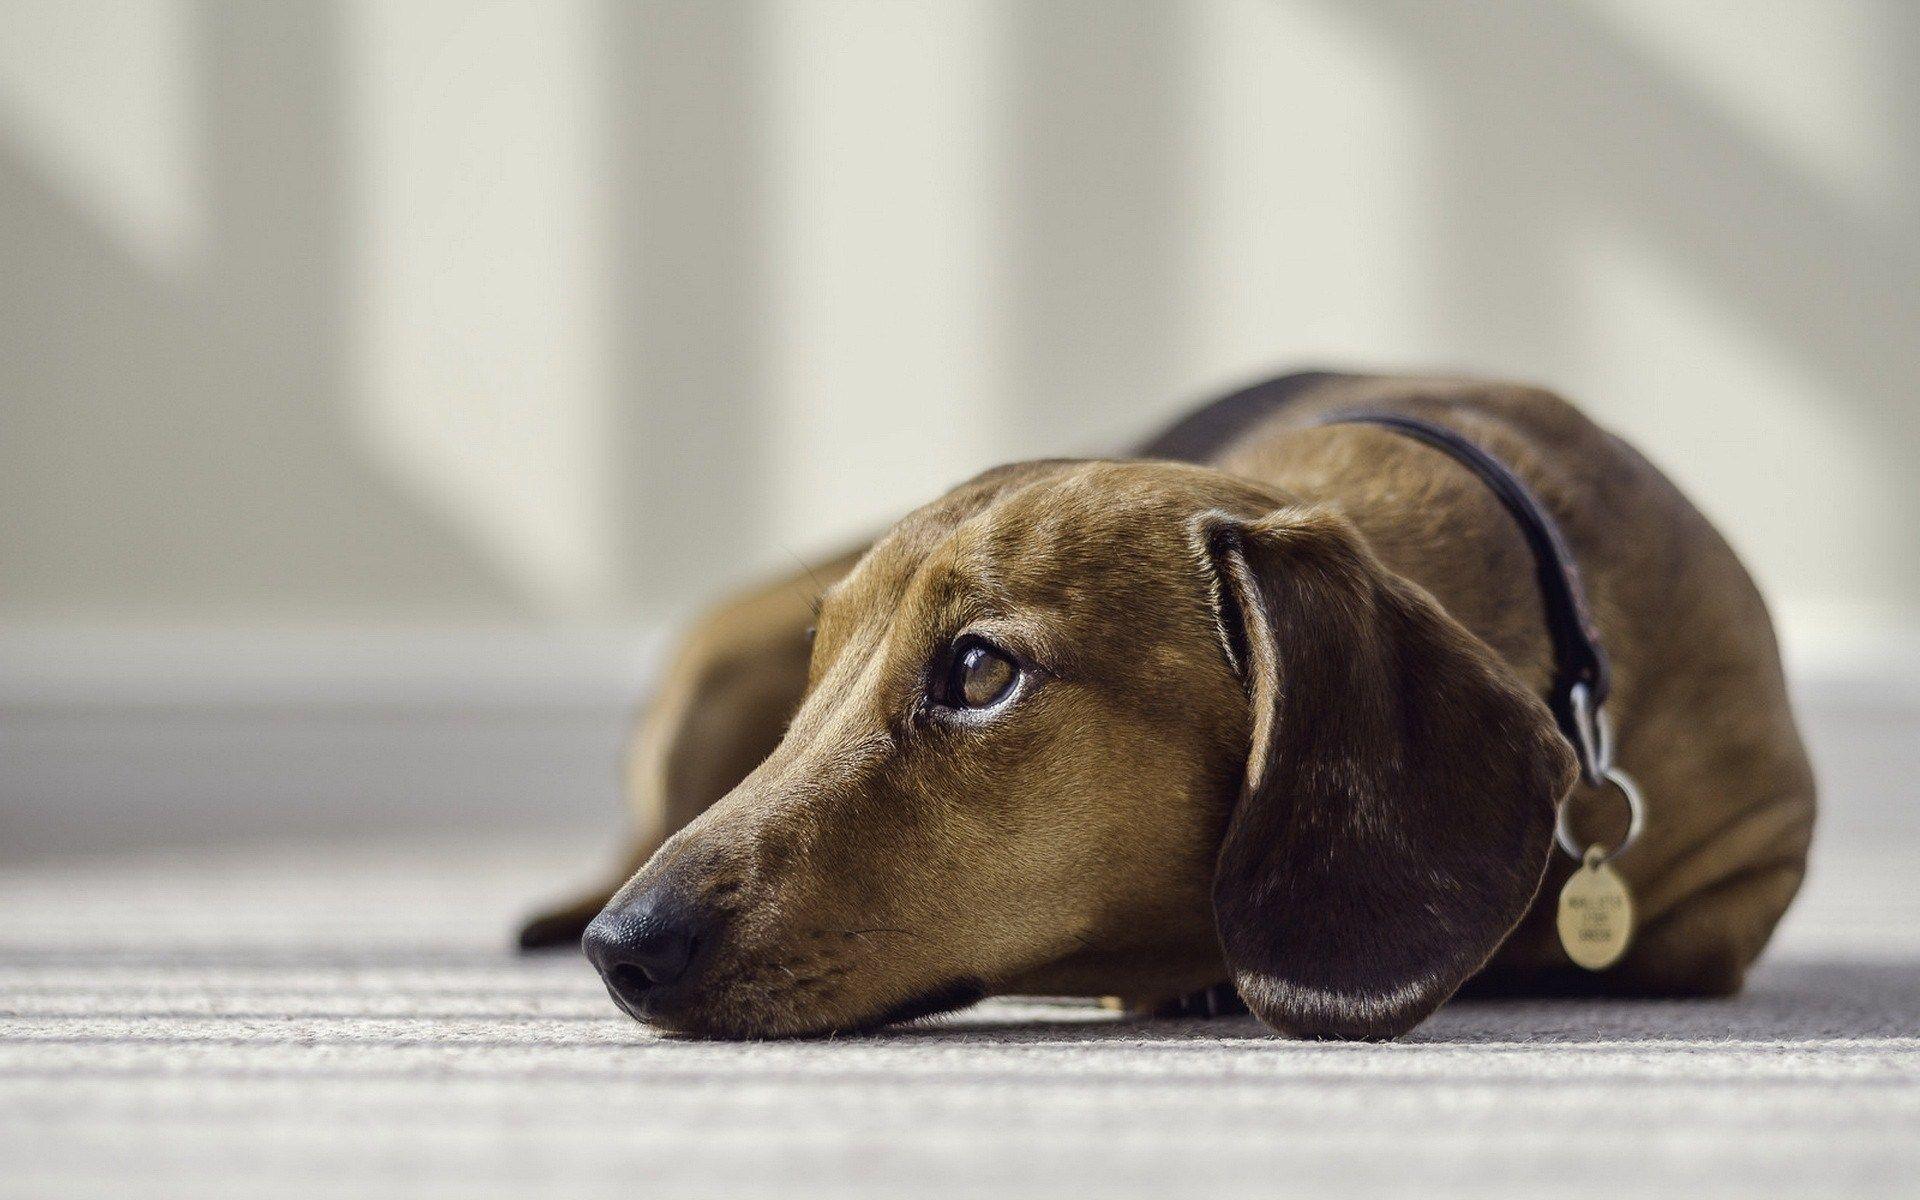 Dog on Carpet pic.jpg